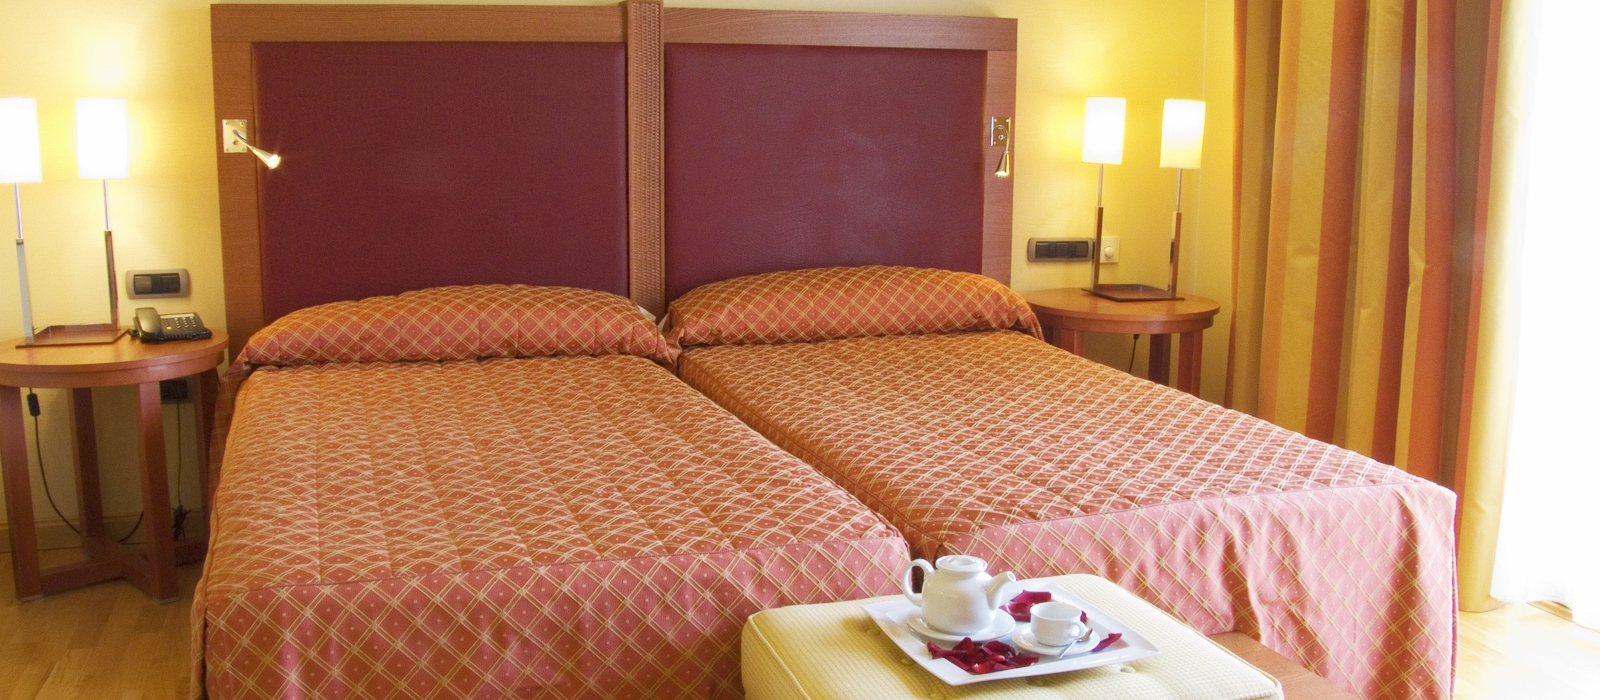 Habitación doble estándar. Hotel Almería Wellness - Vincci Hoteles